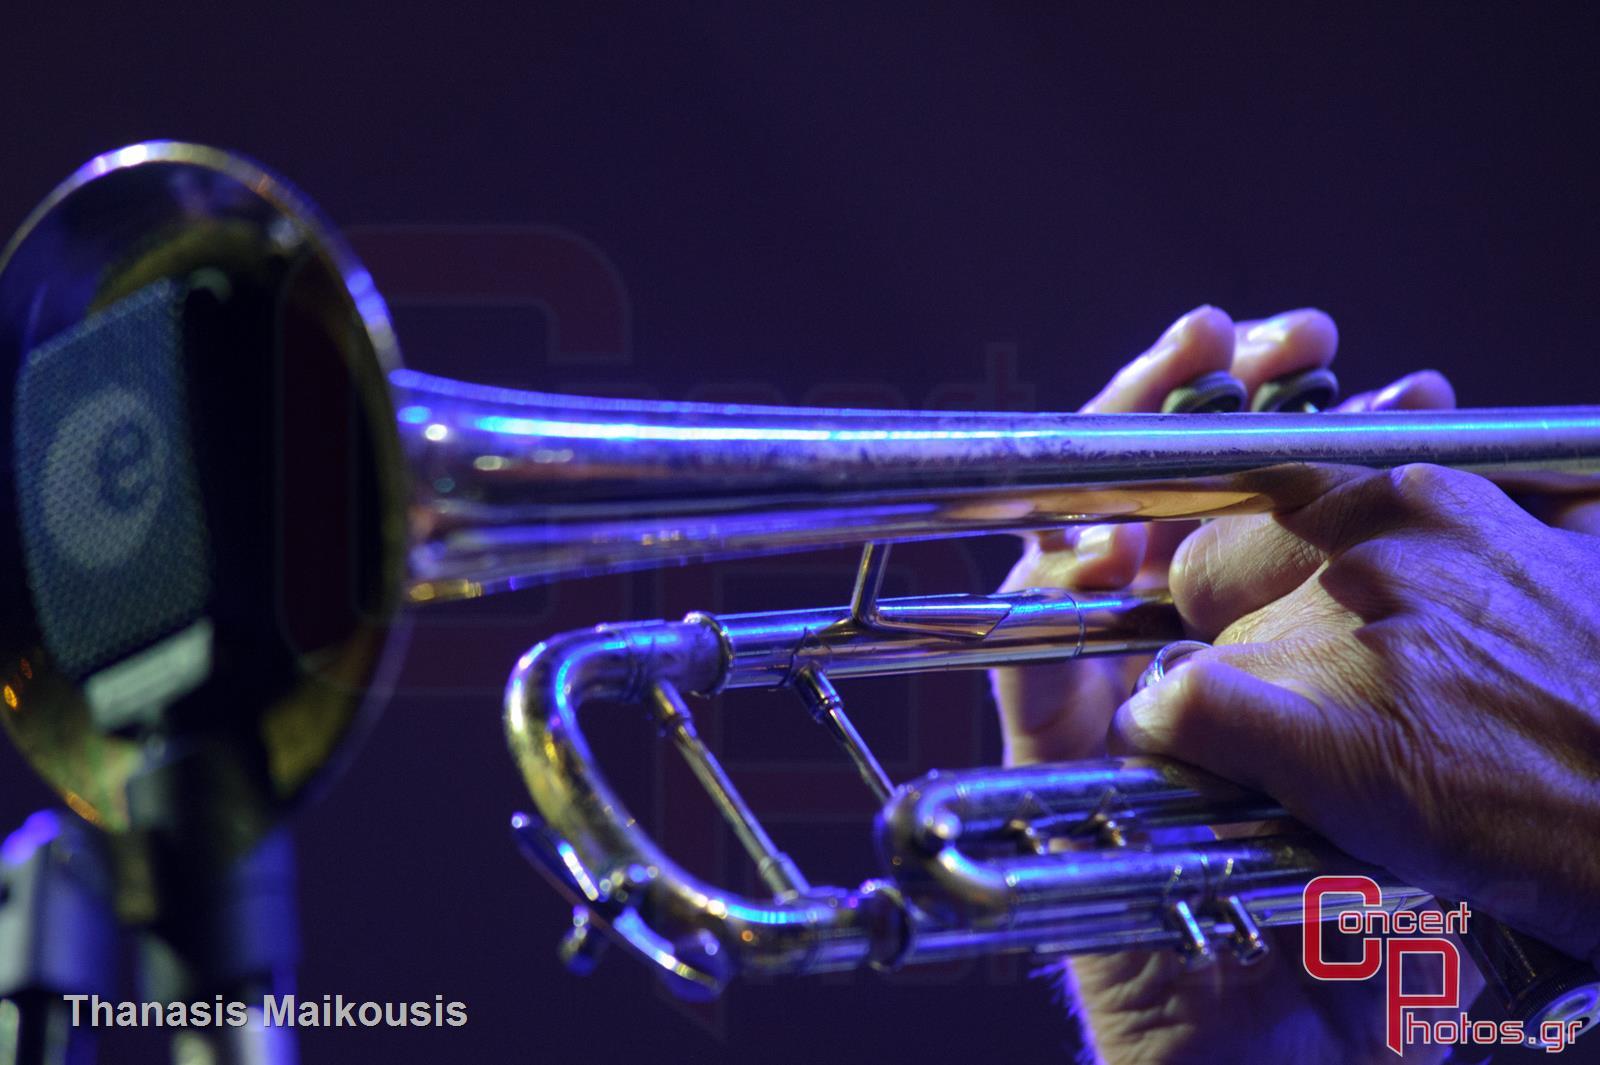 Active Member - Τραγούδα μας να φύγει το σκοτάδι- photographer: Thanasis Maikousis - concertphotos_-5452